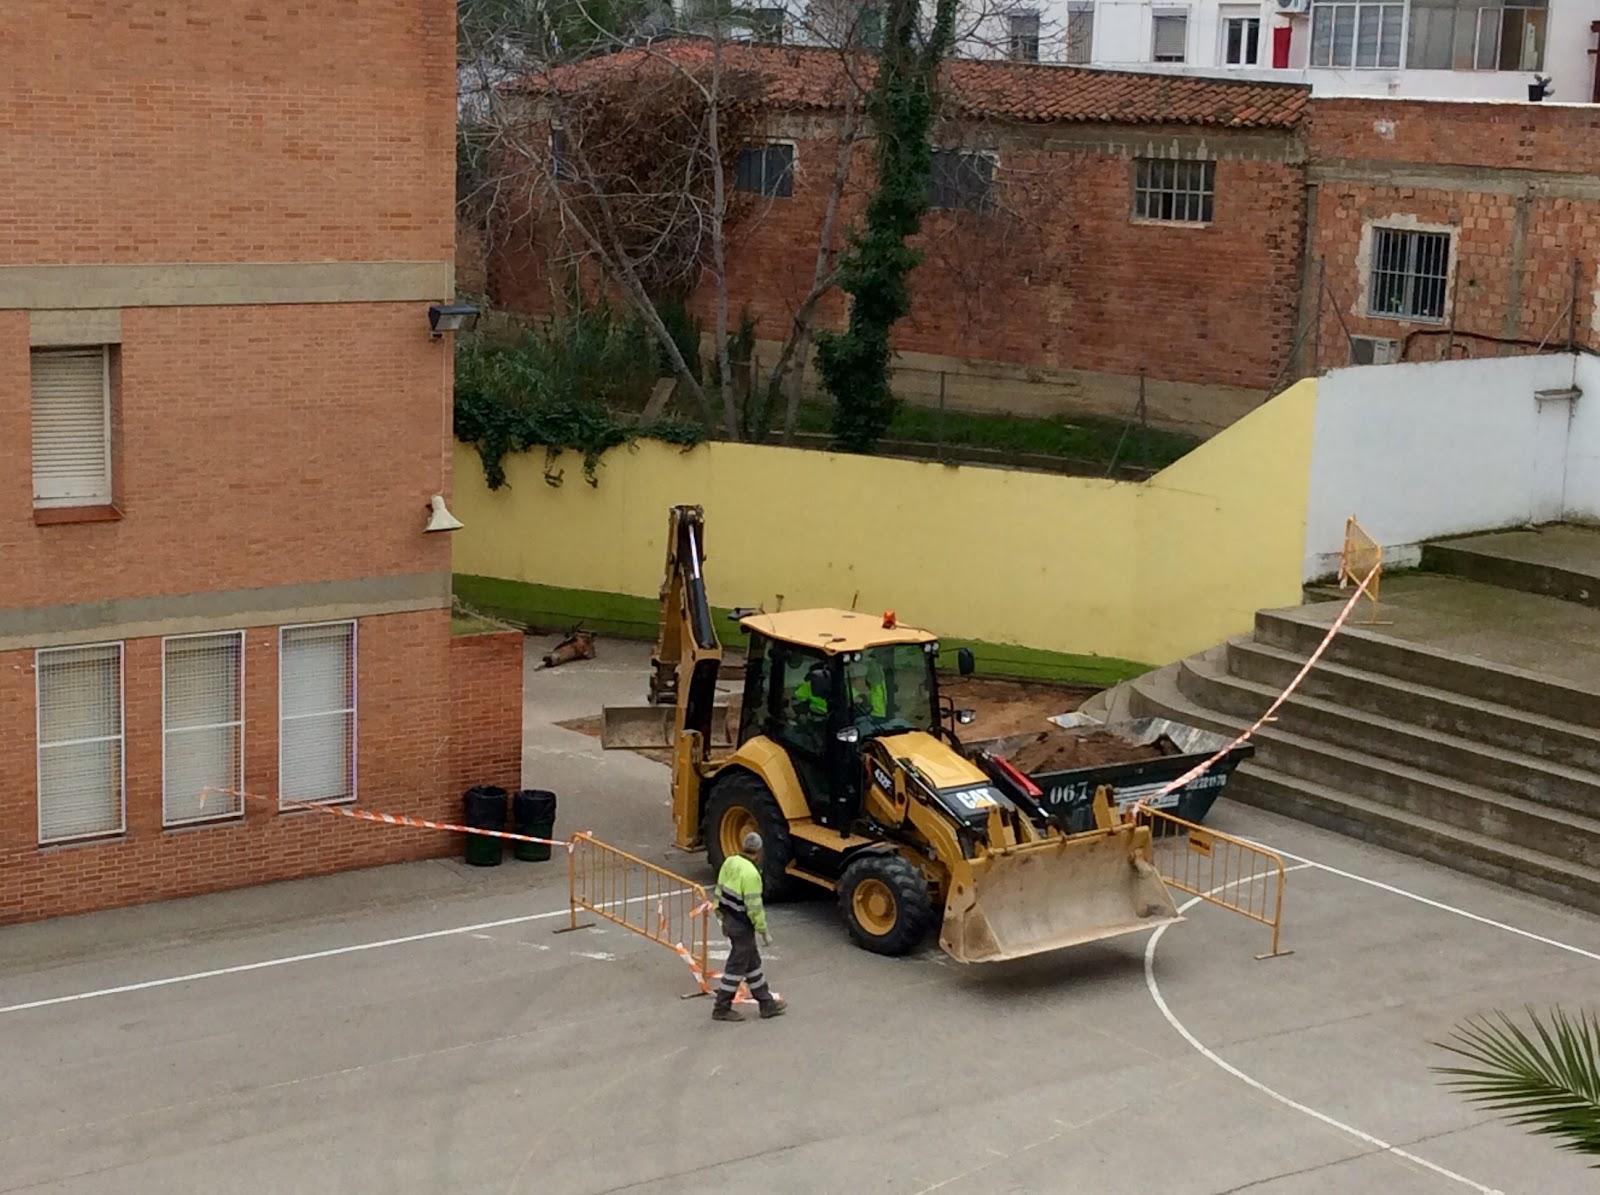 Main zaragoza se inician las obras de la piscina cubierta for Piscina cubierta zaragoza